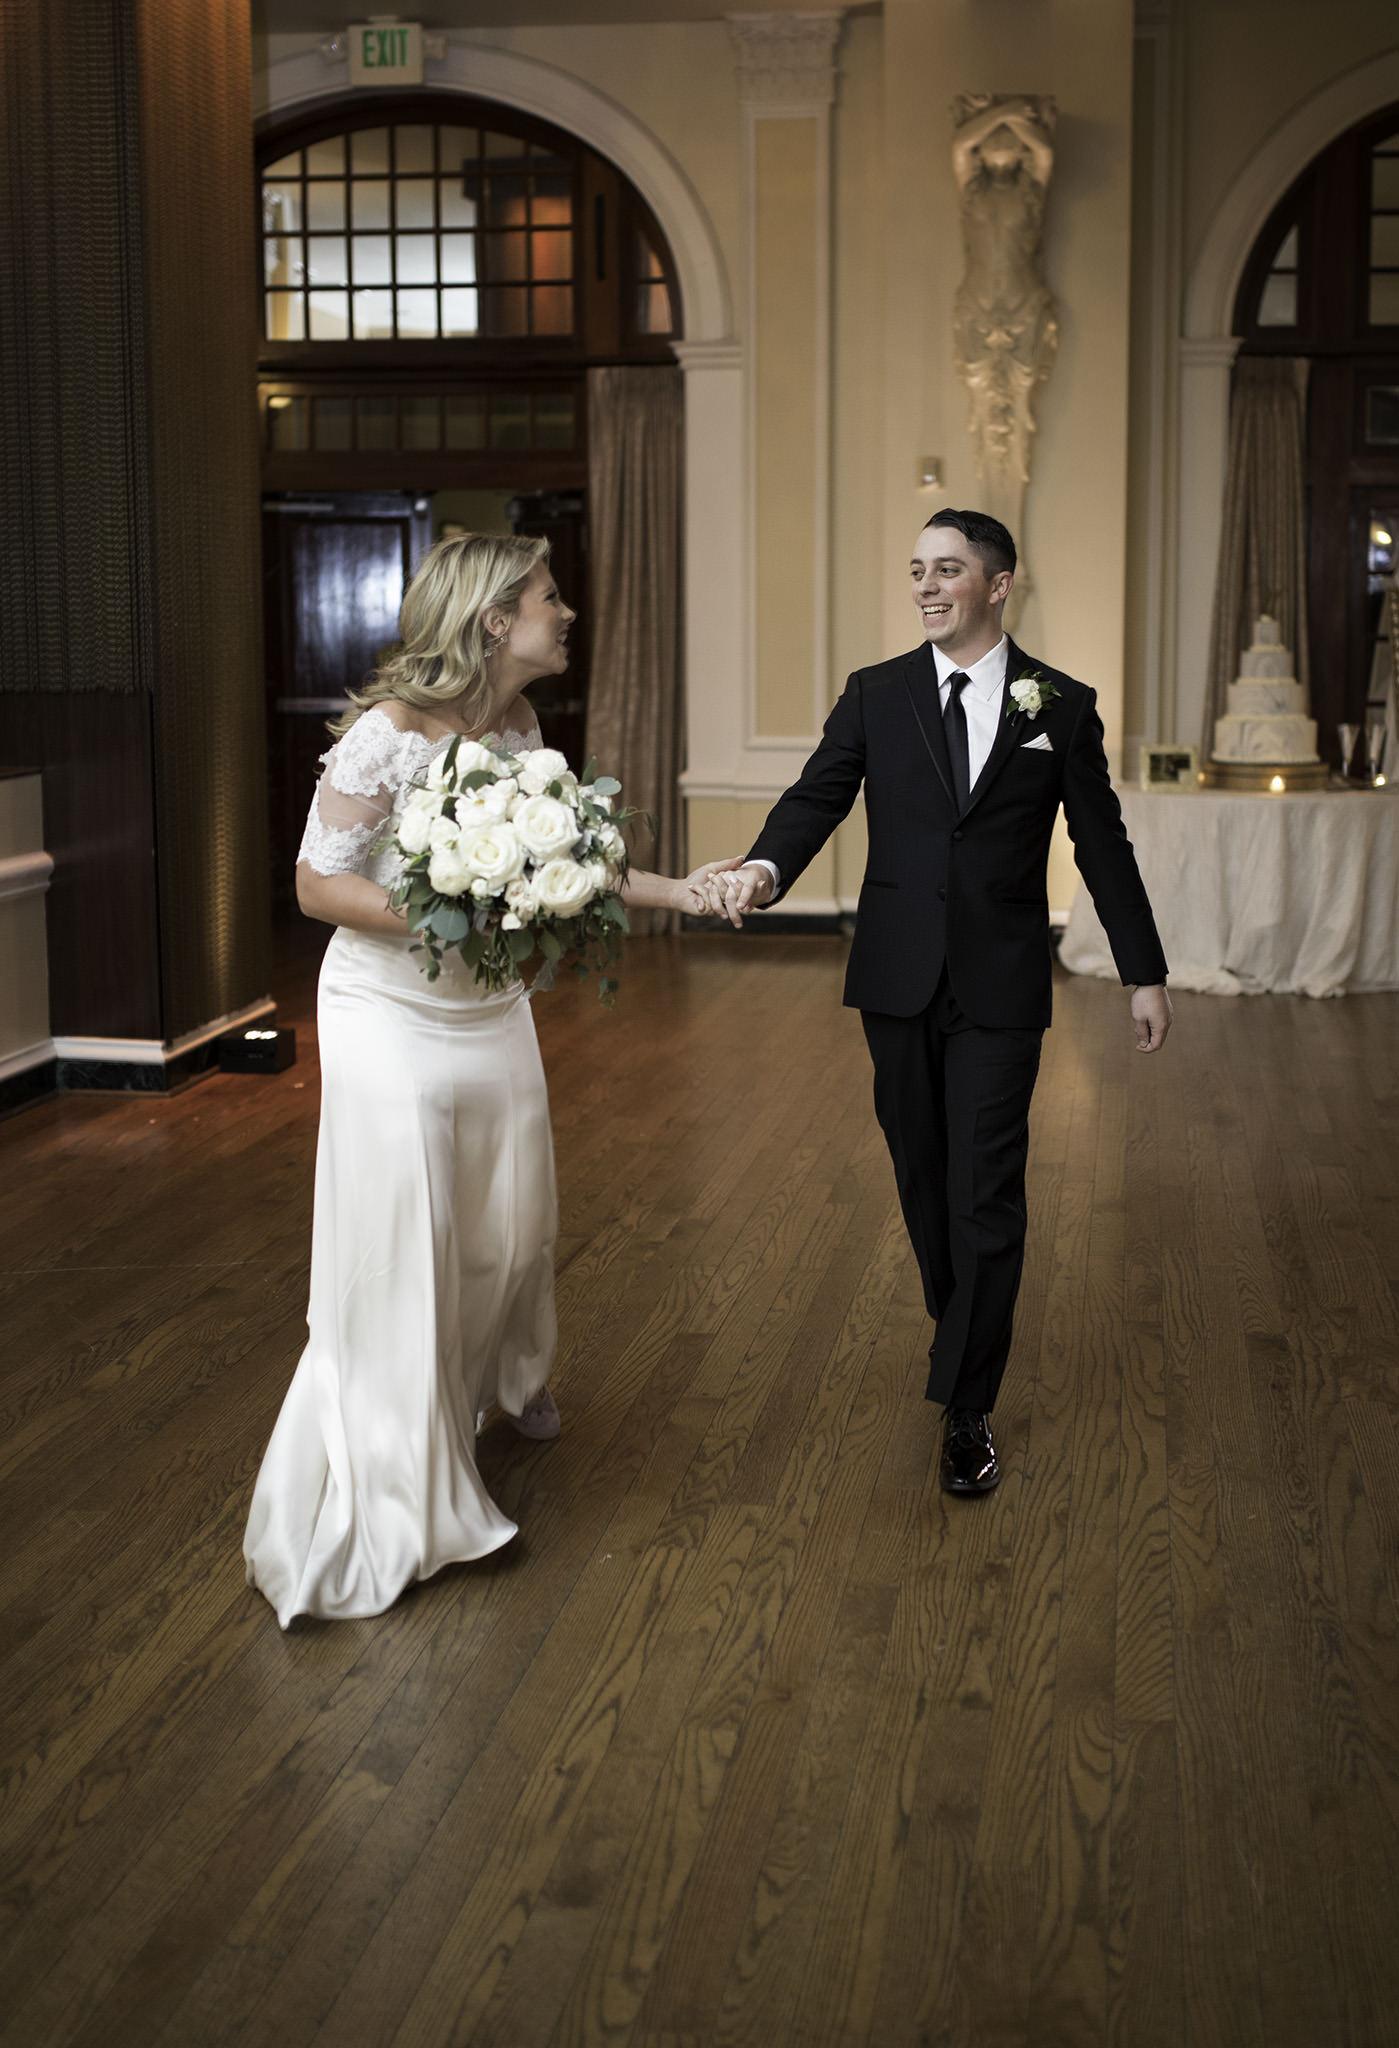 Claire-Travis-Classy-artistic-Downtown-Houston-Rice-ballroom-wedding-sm-021.jpg